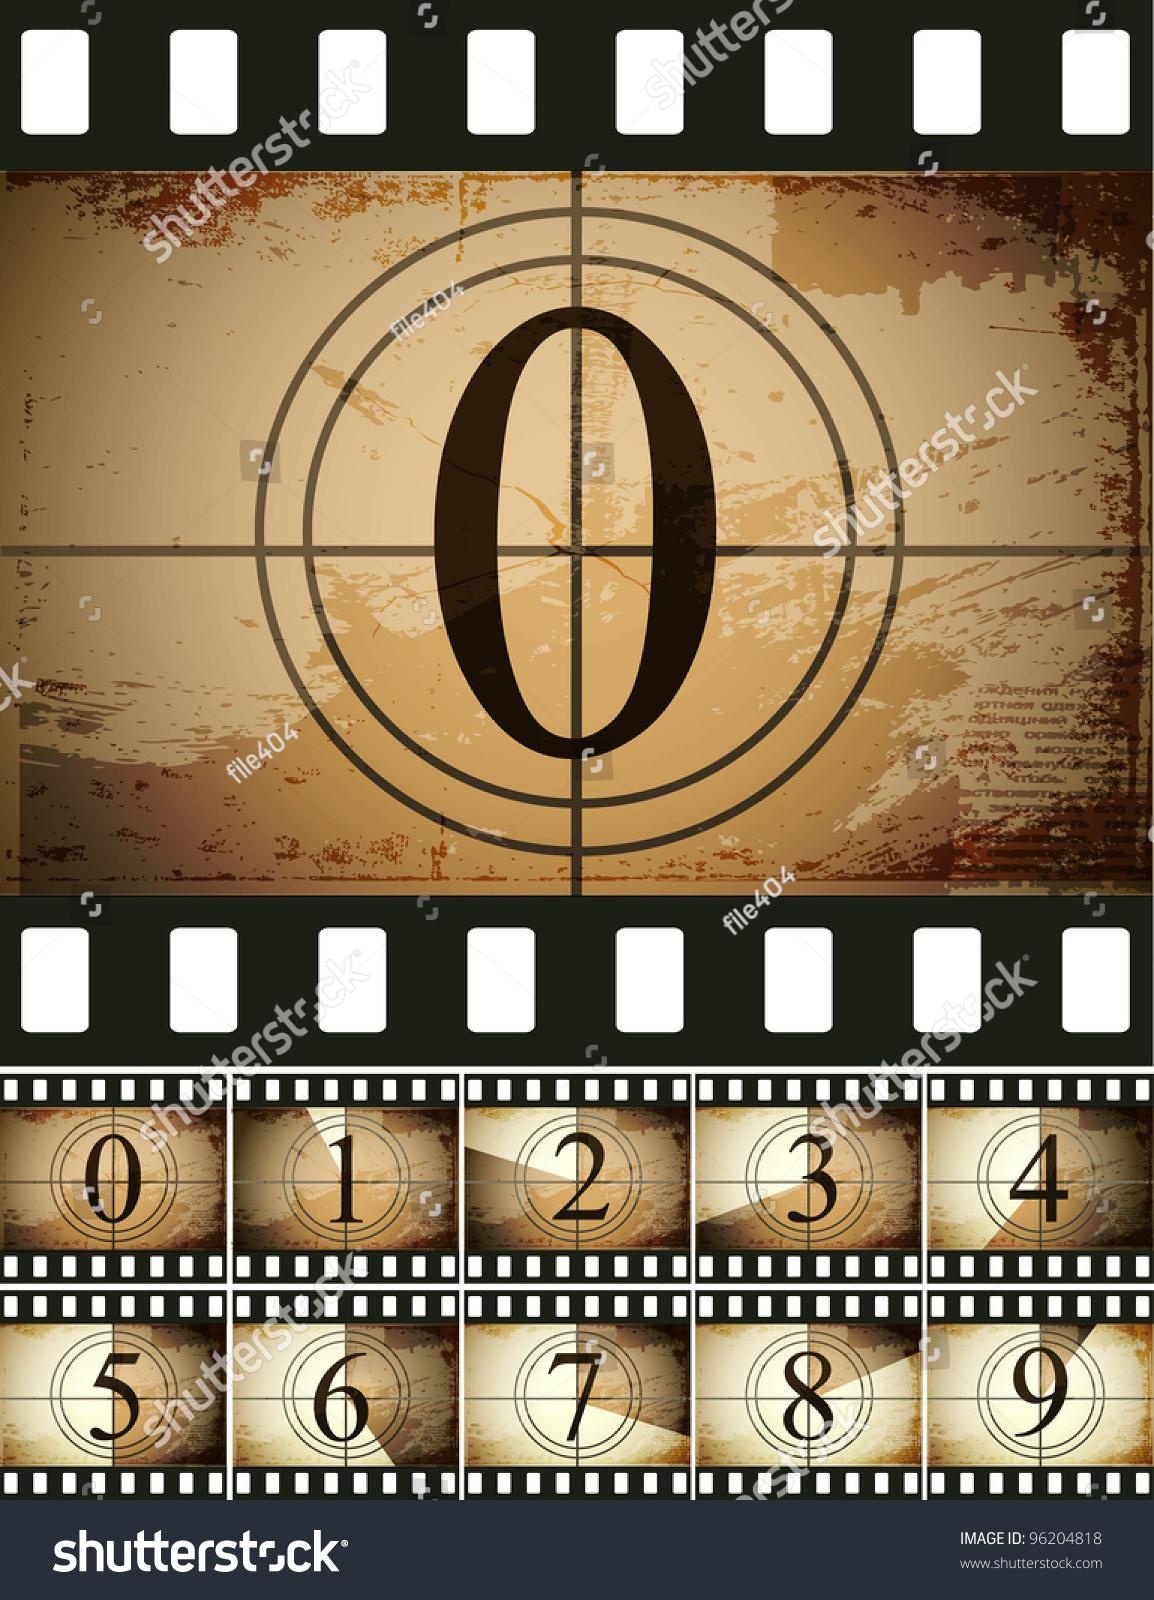 Film Countdown: Grunge Film Countdown Stock Vector Illustration 96204818